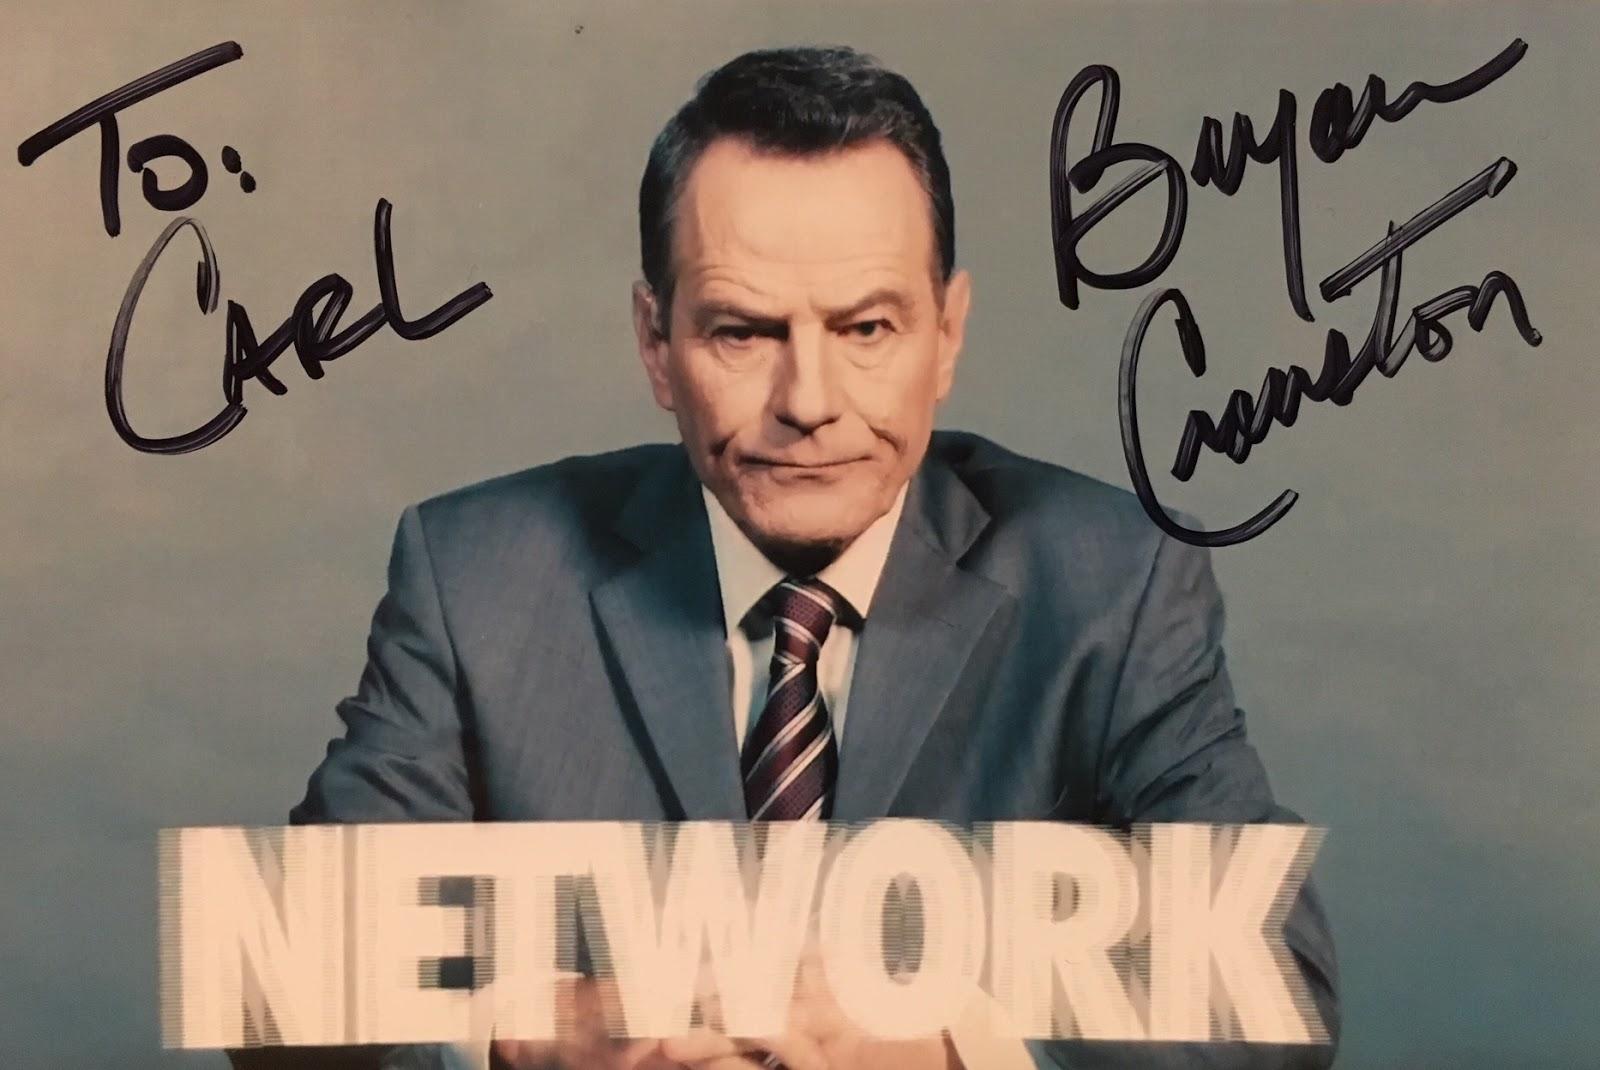 Celebrity Signings: Bryan Cranston (Breaking Bad, Malcolm in